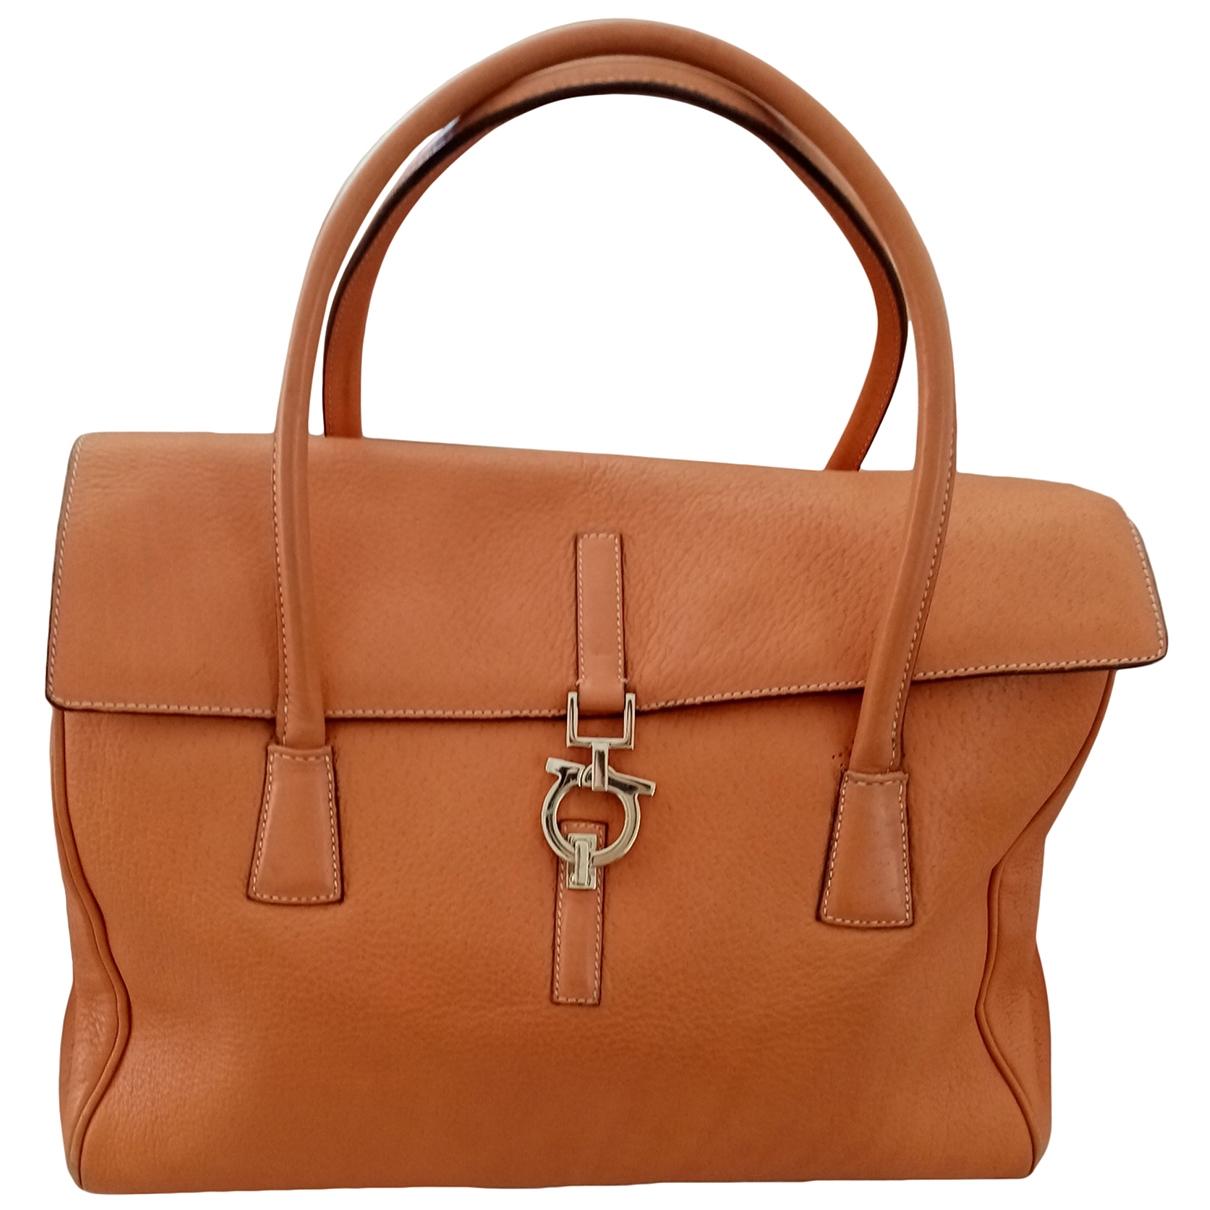 Salvatore Ferragamo \N Orange Leather handbag for Women \N